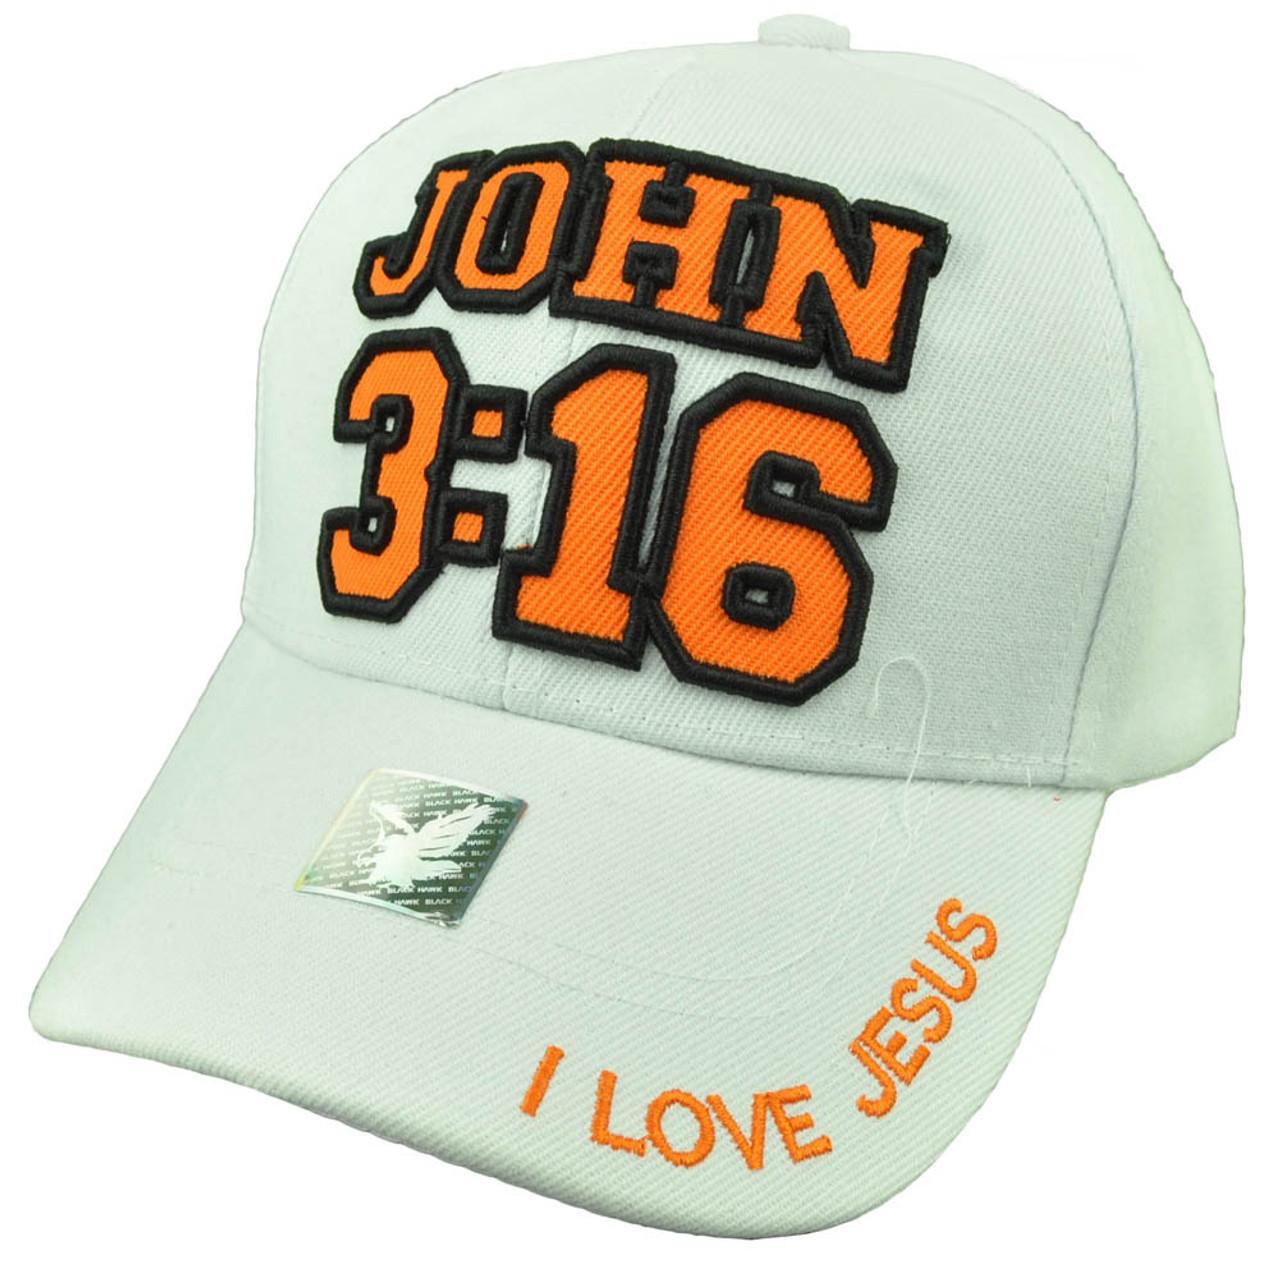 I Love Jesus John 3:16 Bible Verse White Orange Adjustable Hat Cap God  Religious